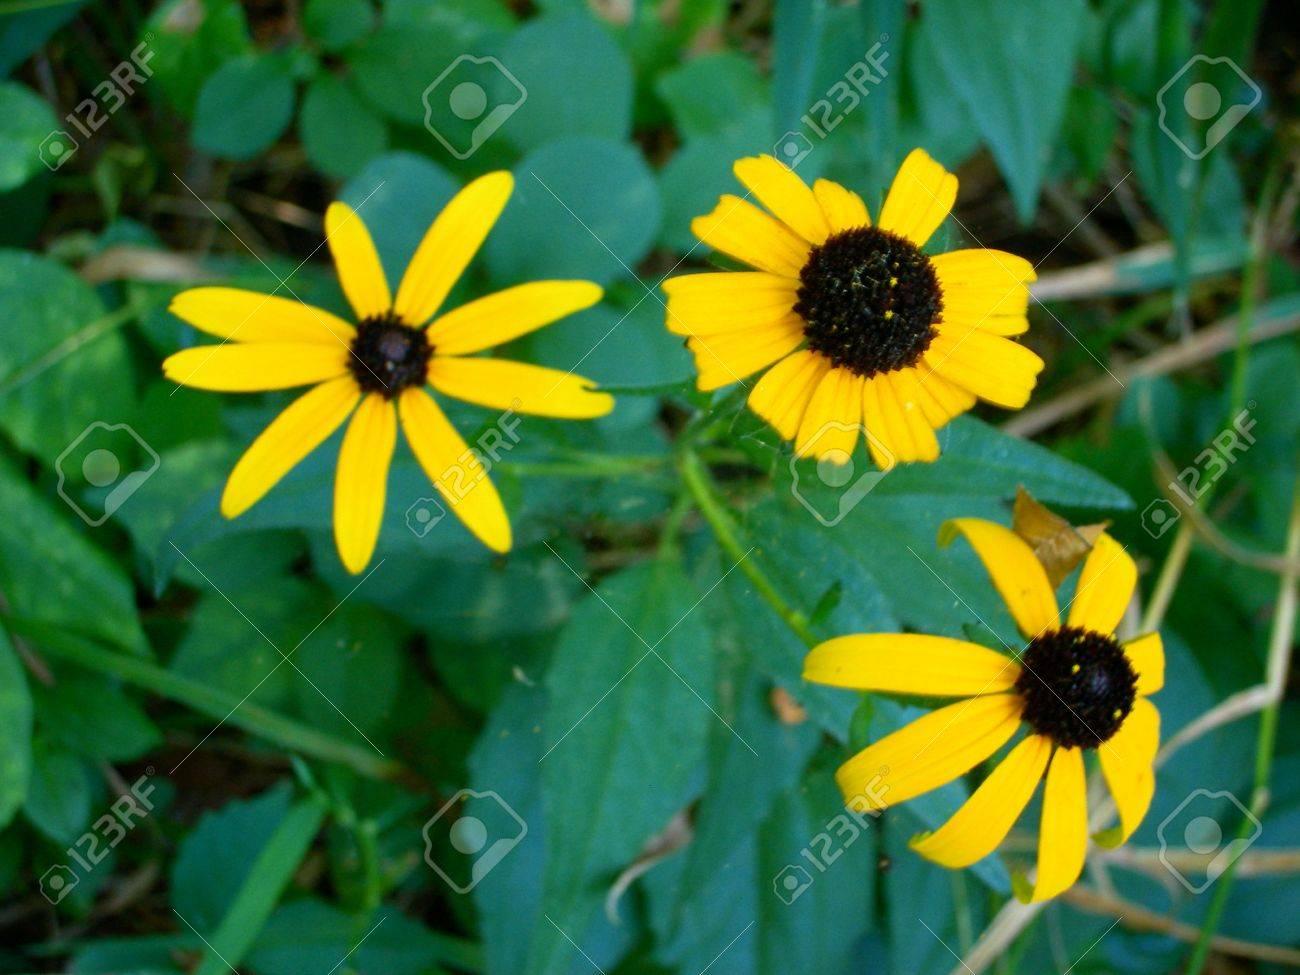 Three Black Eyed Susan Flowers Yellow Daisy Like Flowers With